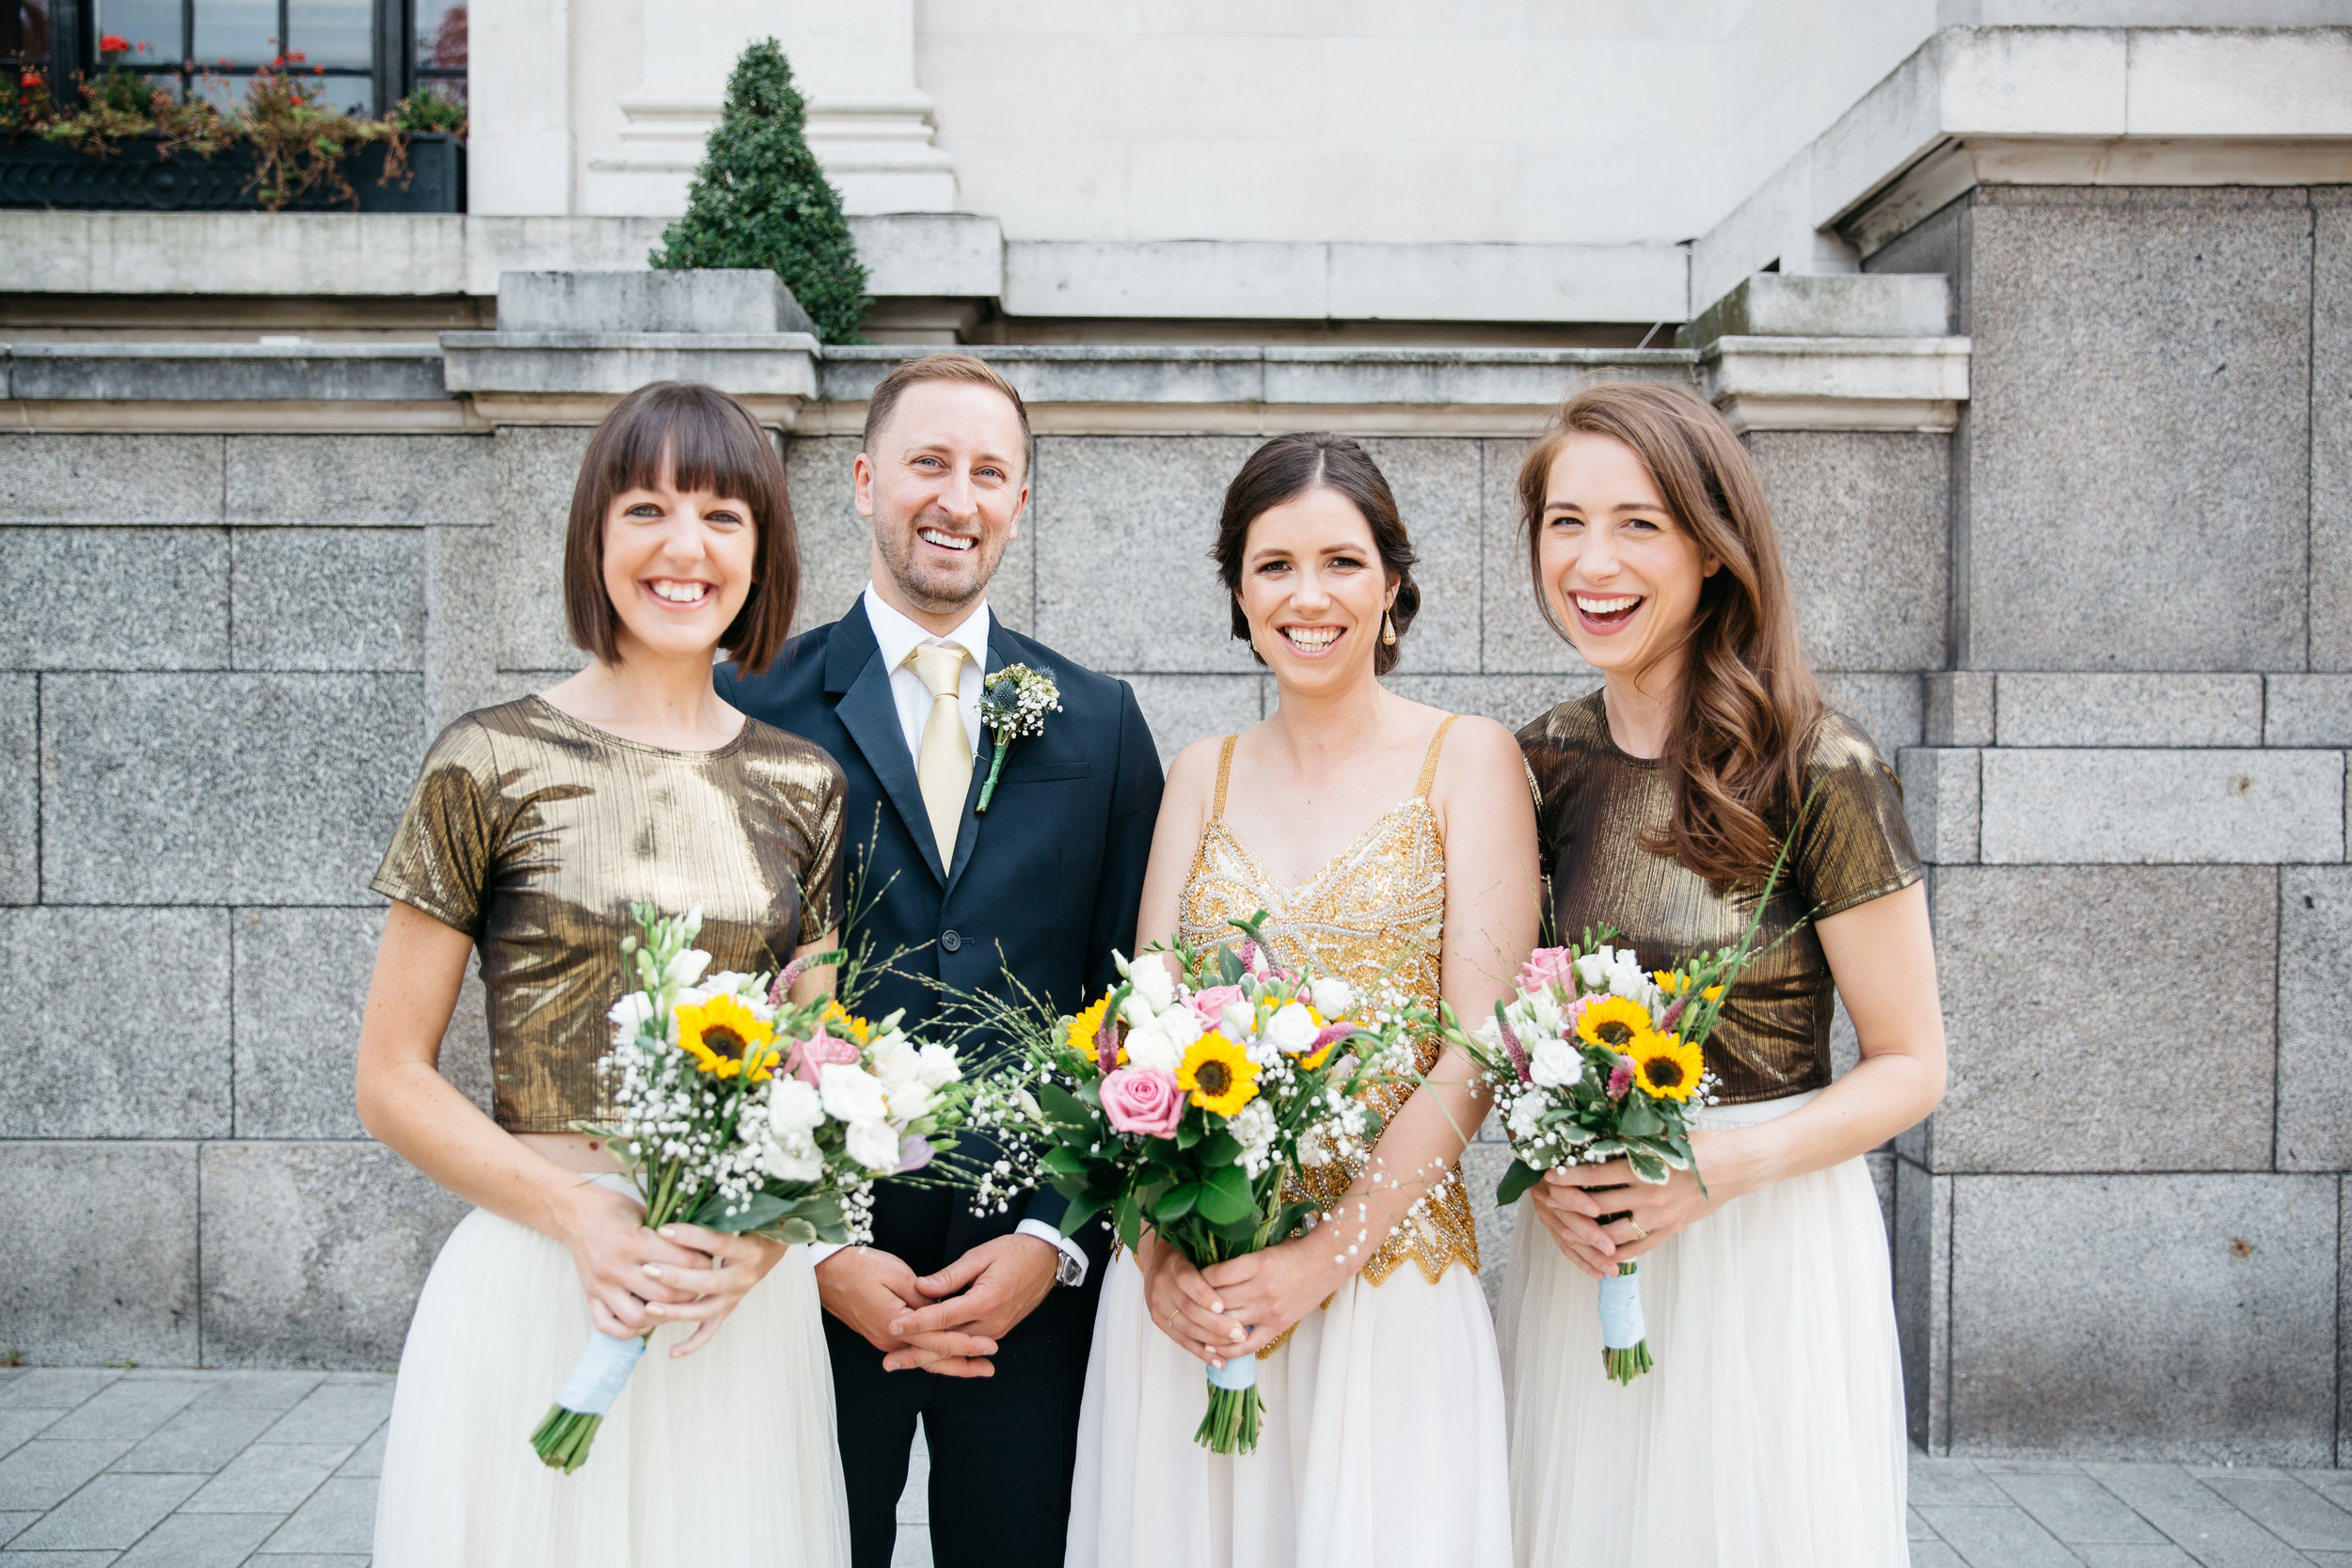 Bride, Bridesmaids and Bridesman at Islington Town Hall - London Wedding Photographer